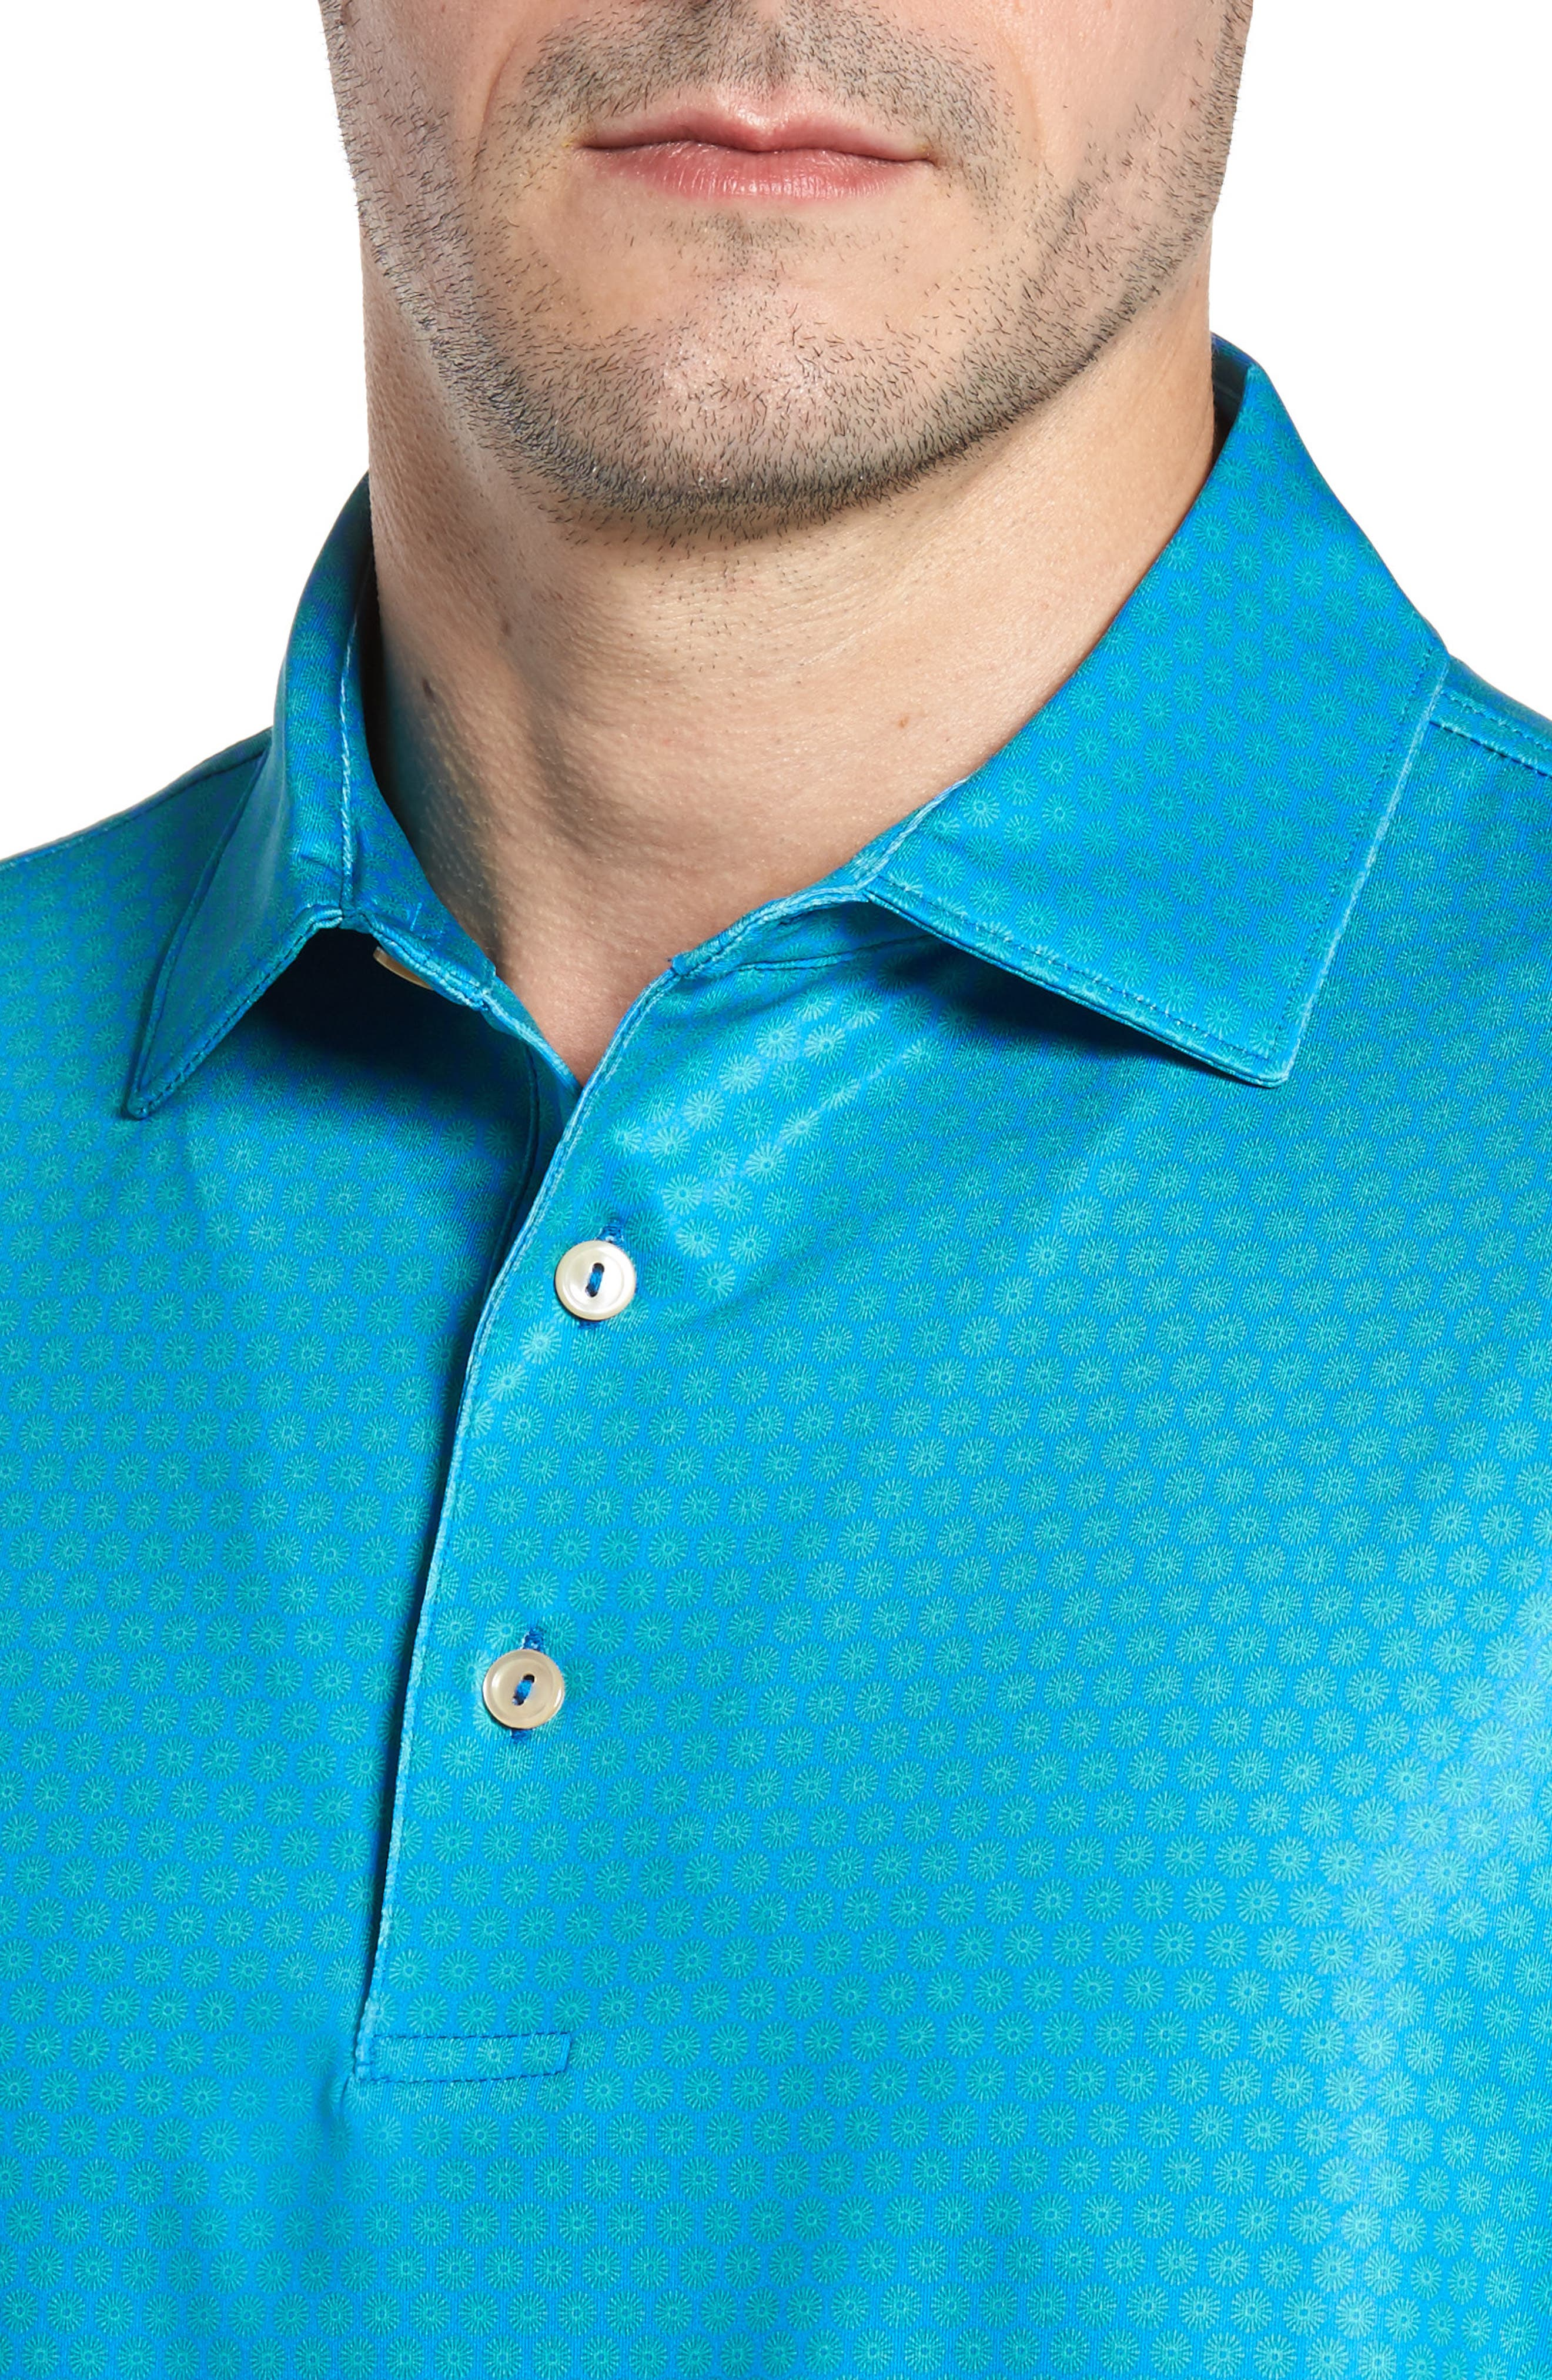 Sean Mata Sunburst Stretch Jersey Polo,                             Alternate thumbnail 4, color,                             403